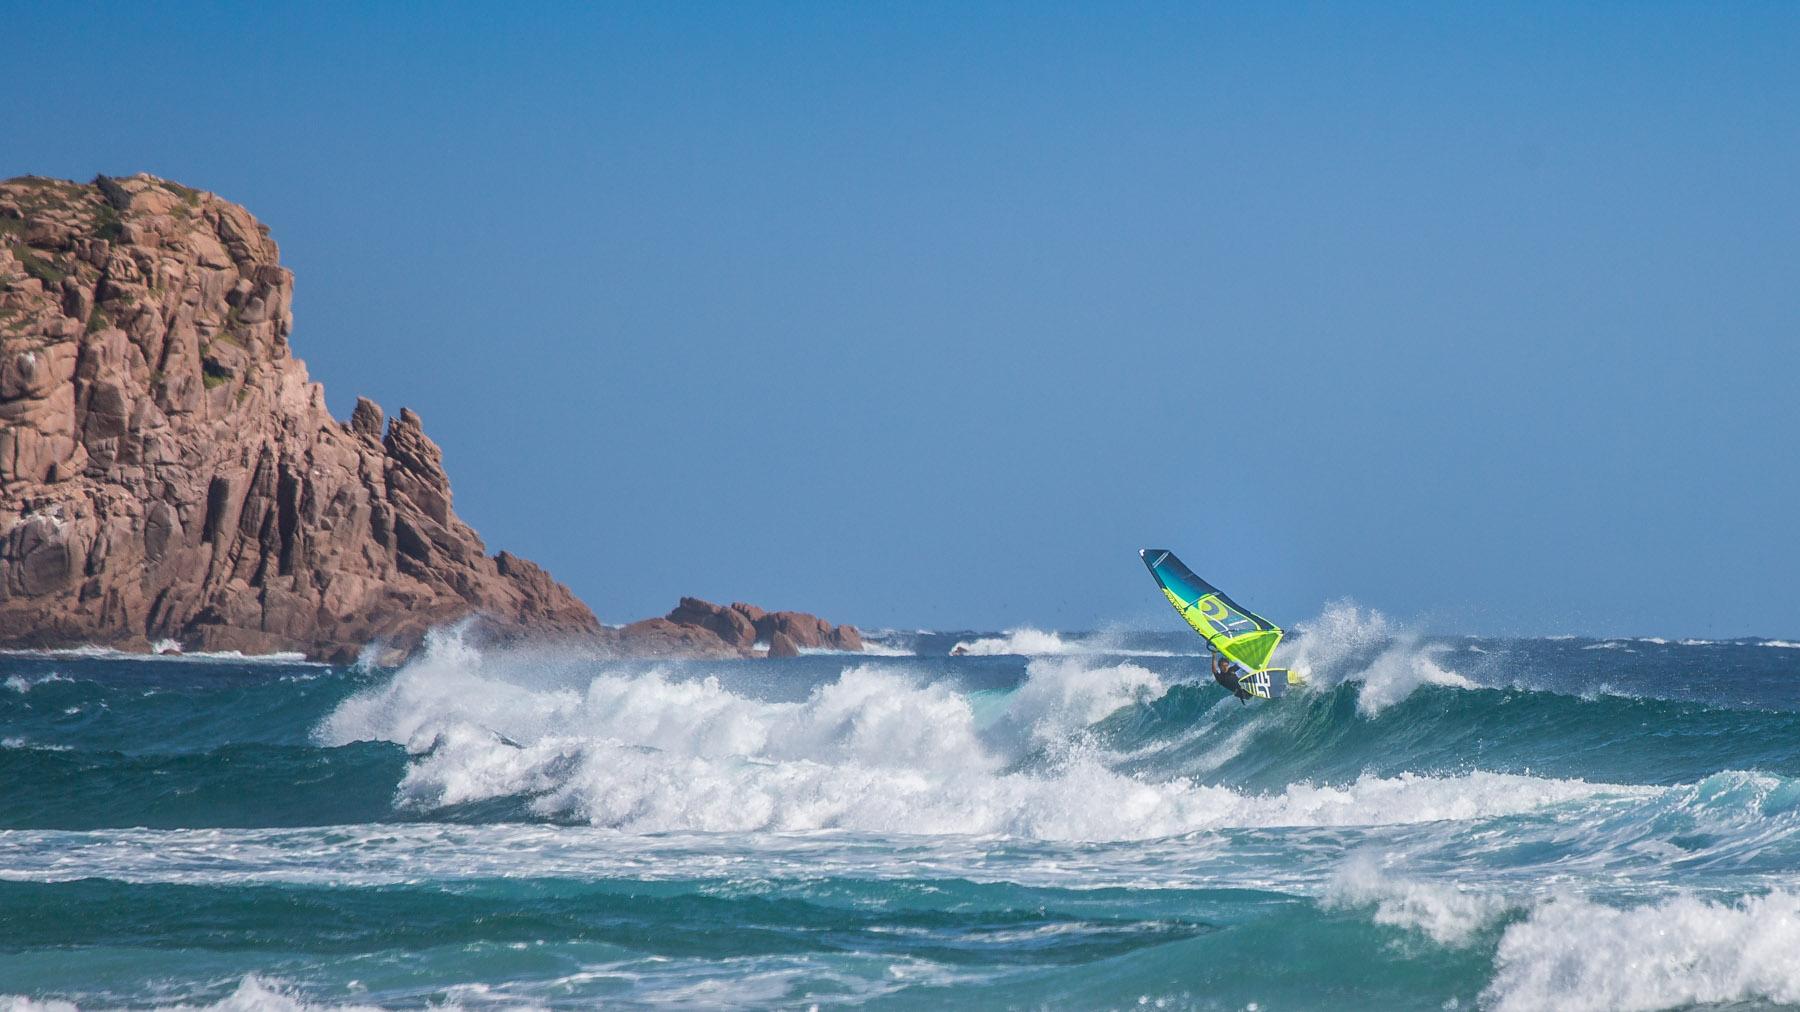 phillip island windsurfing at woolamai